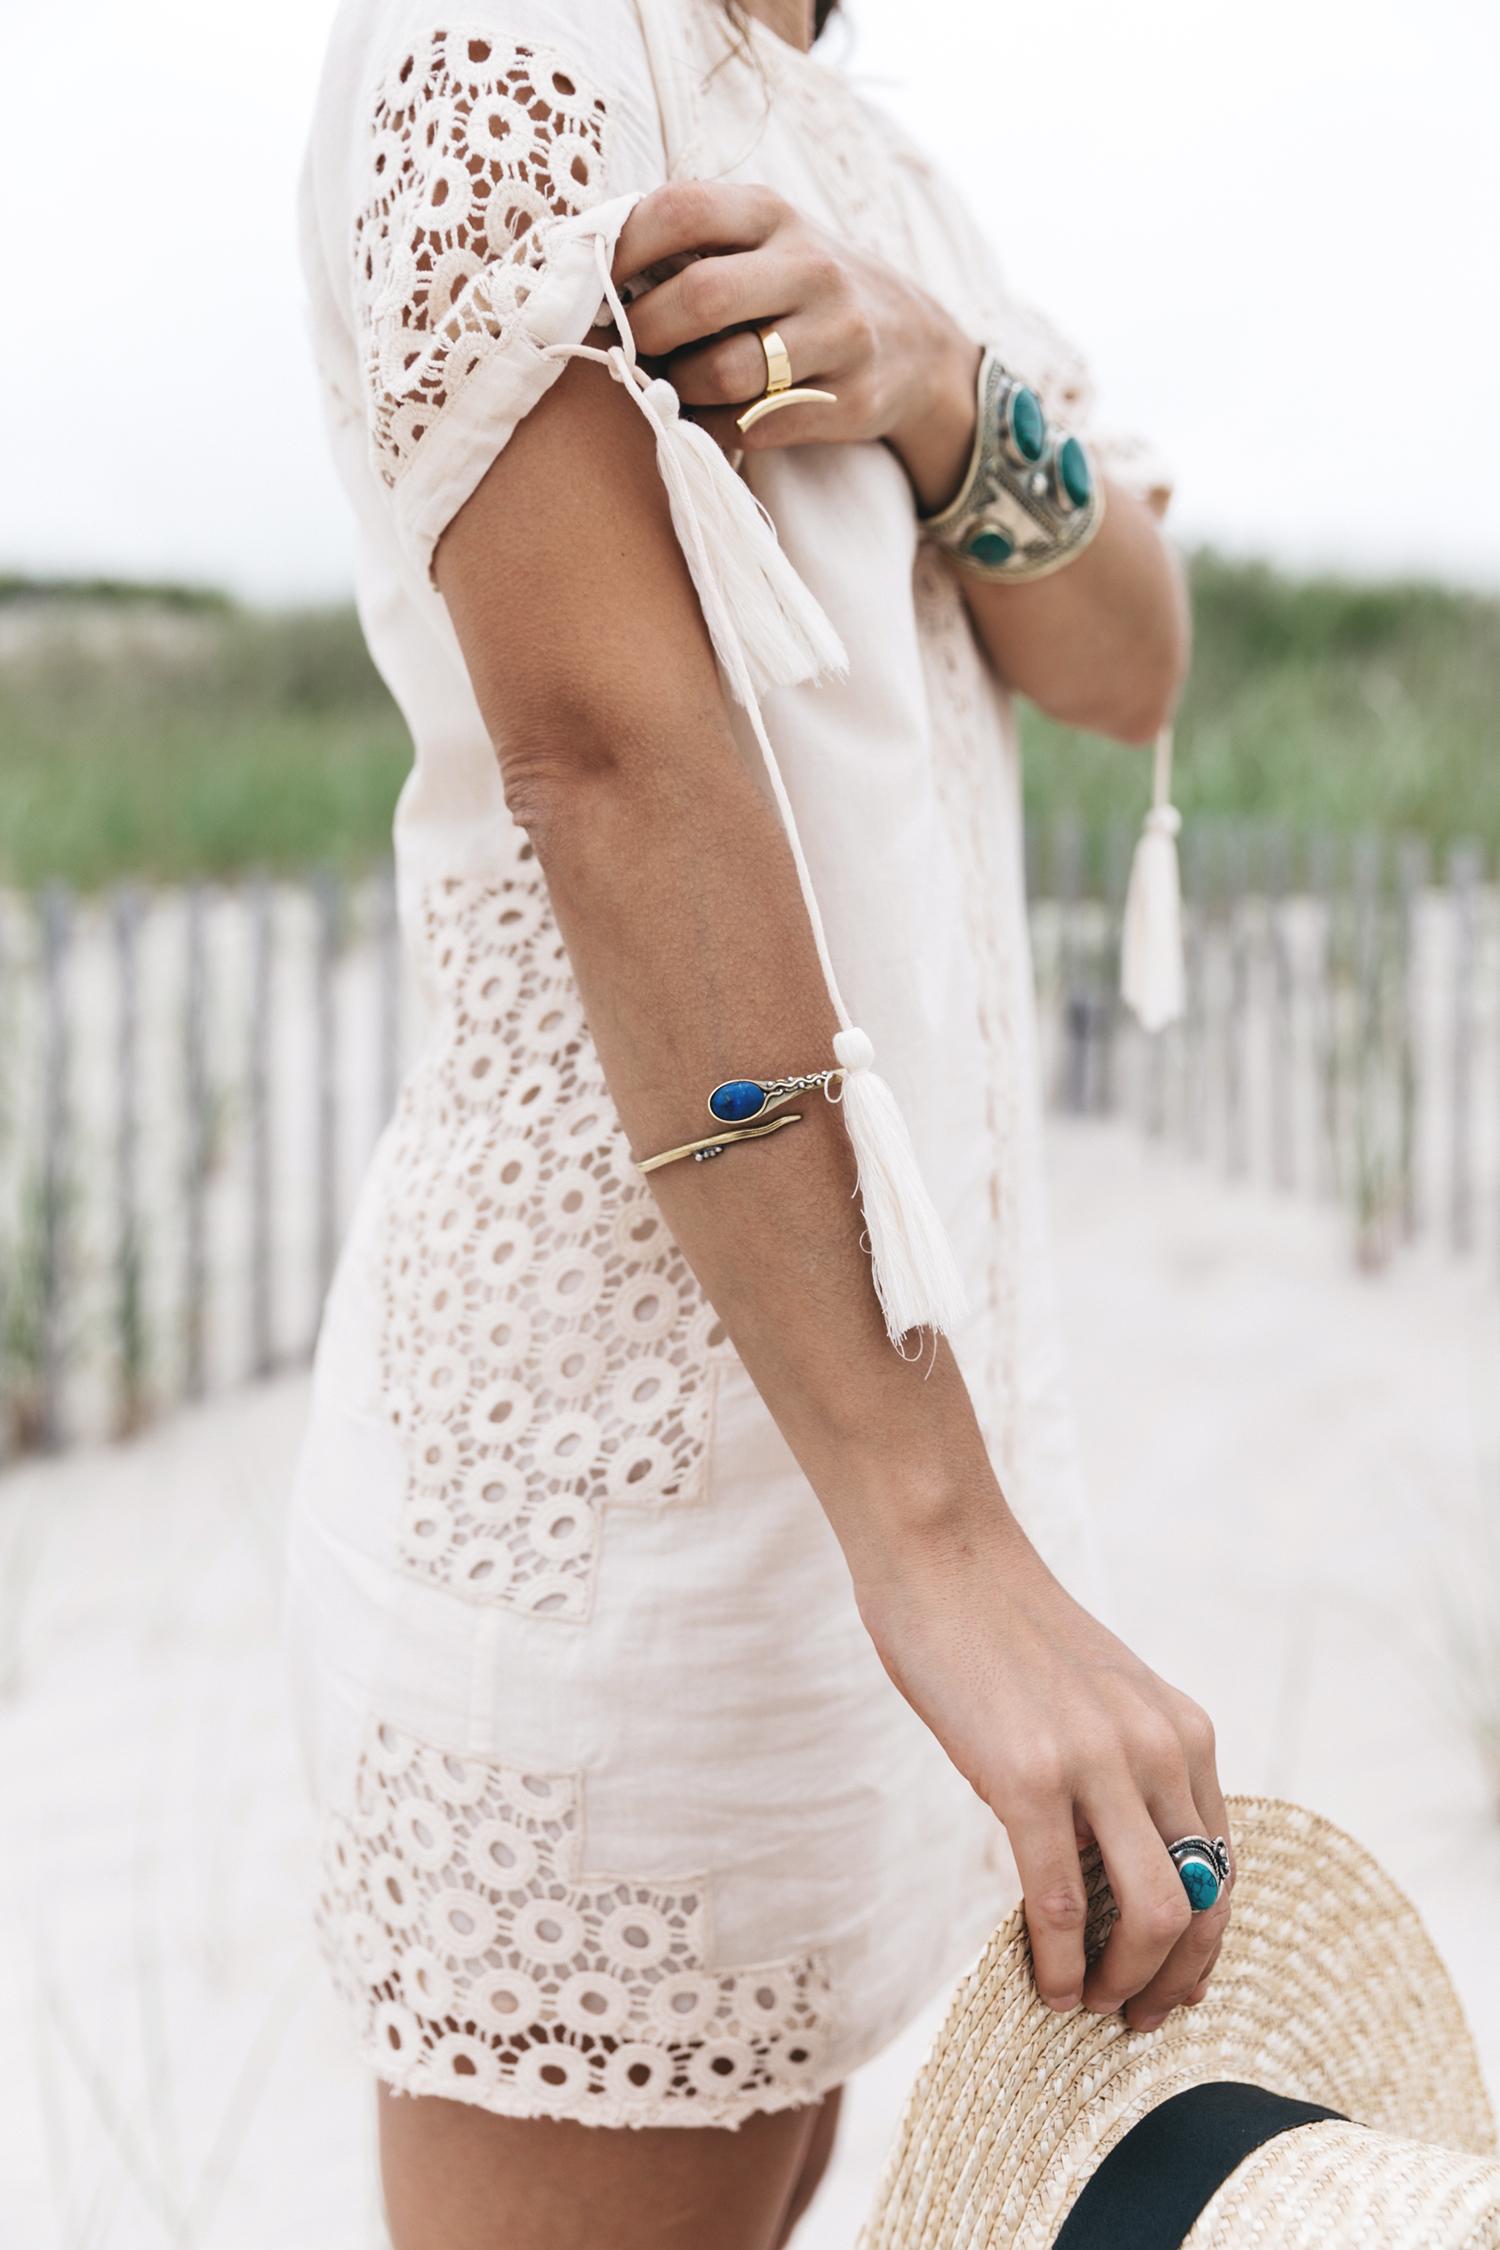 Revolve_in_The_Hamptons-Revolve_Clothing-Collage_Vintage-Cream_Dress-Tularosa-Canotier-15